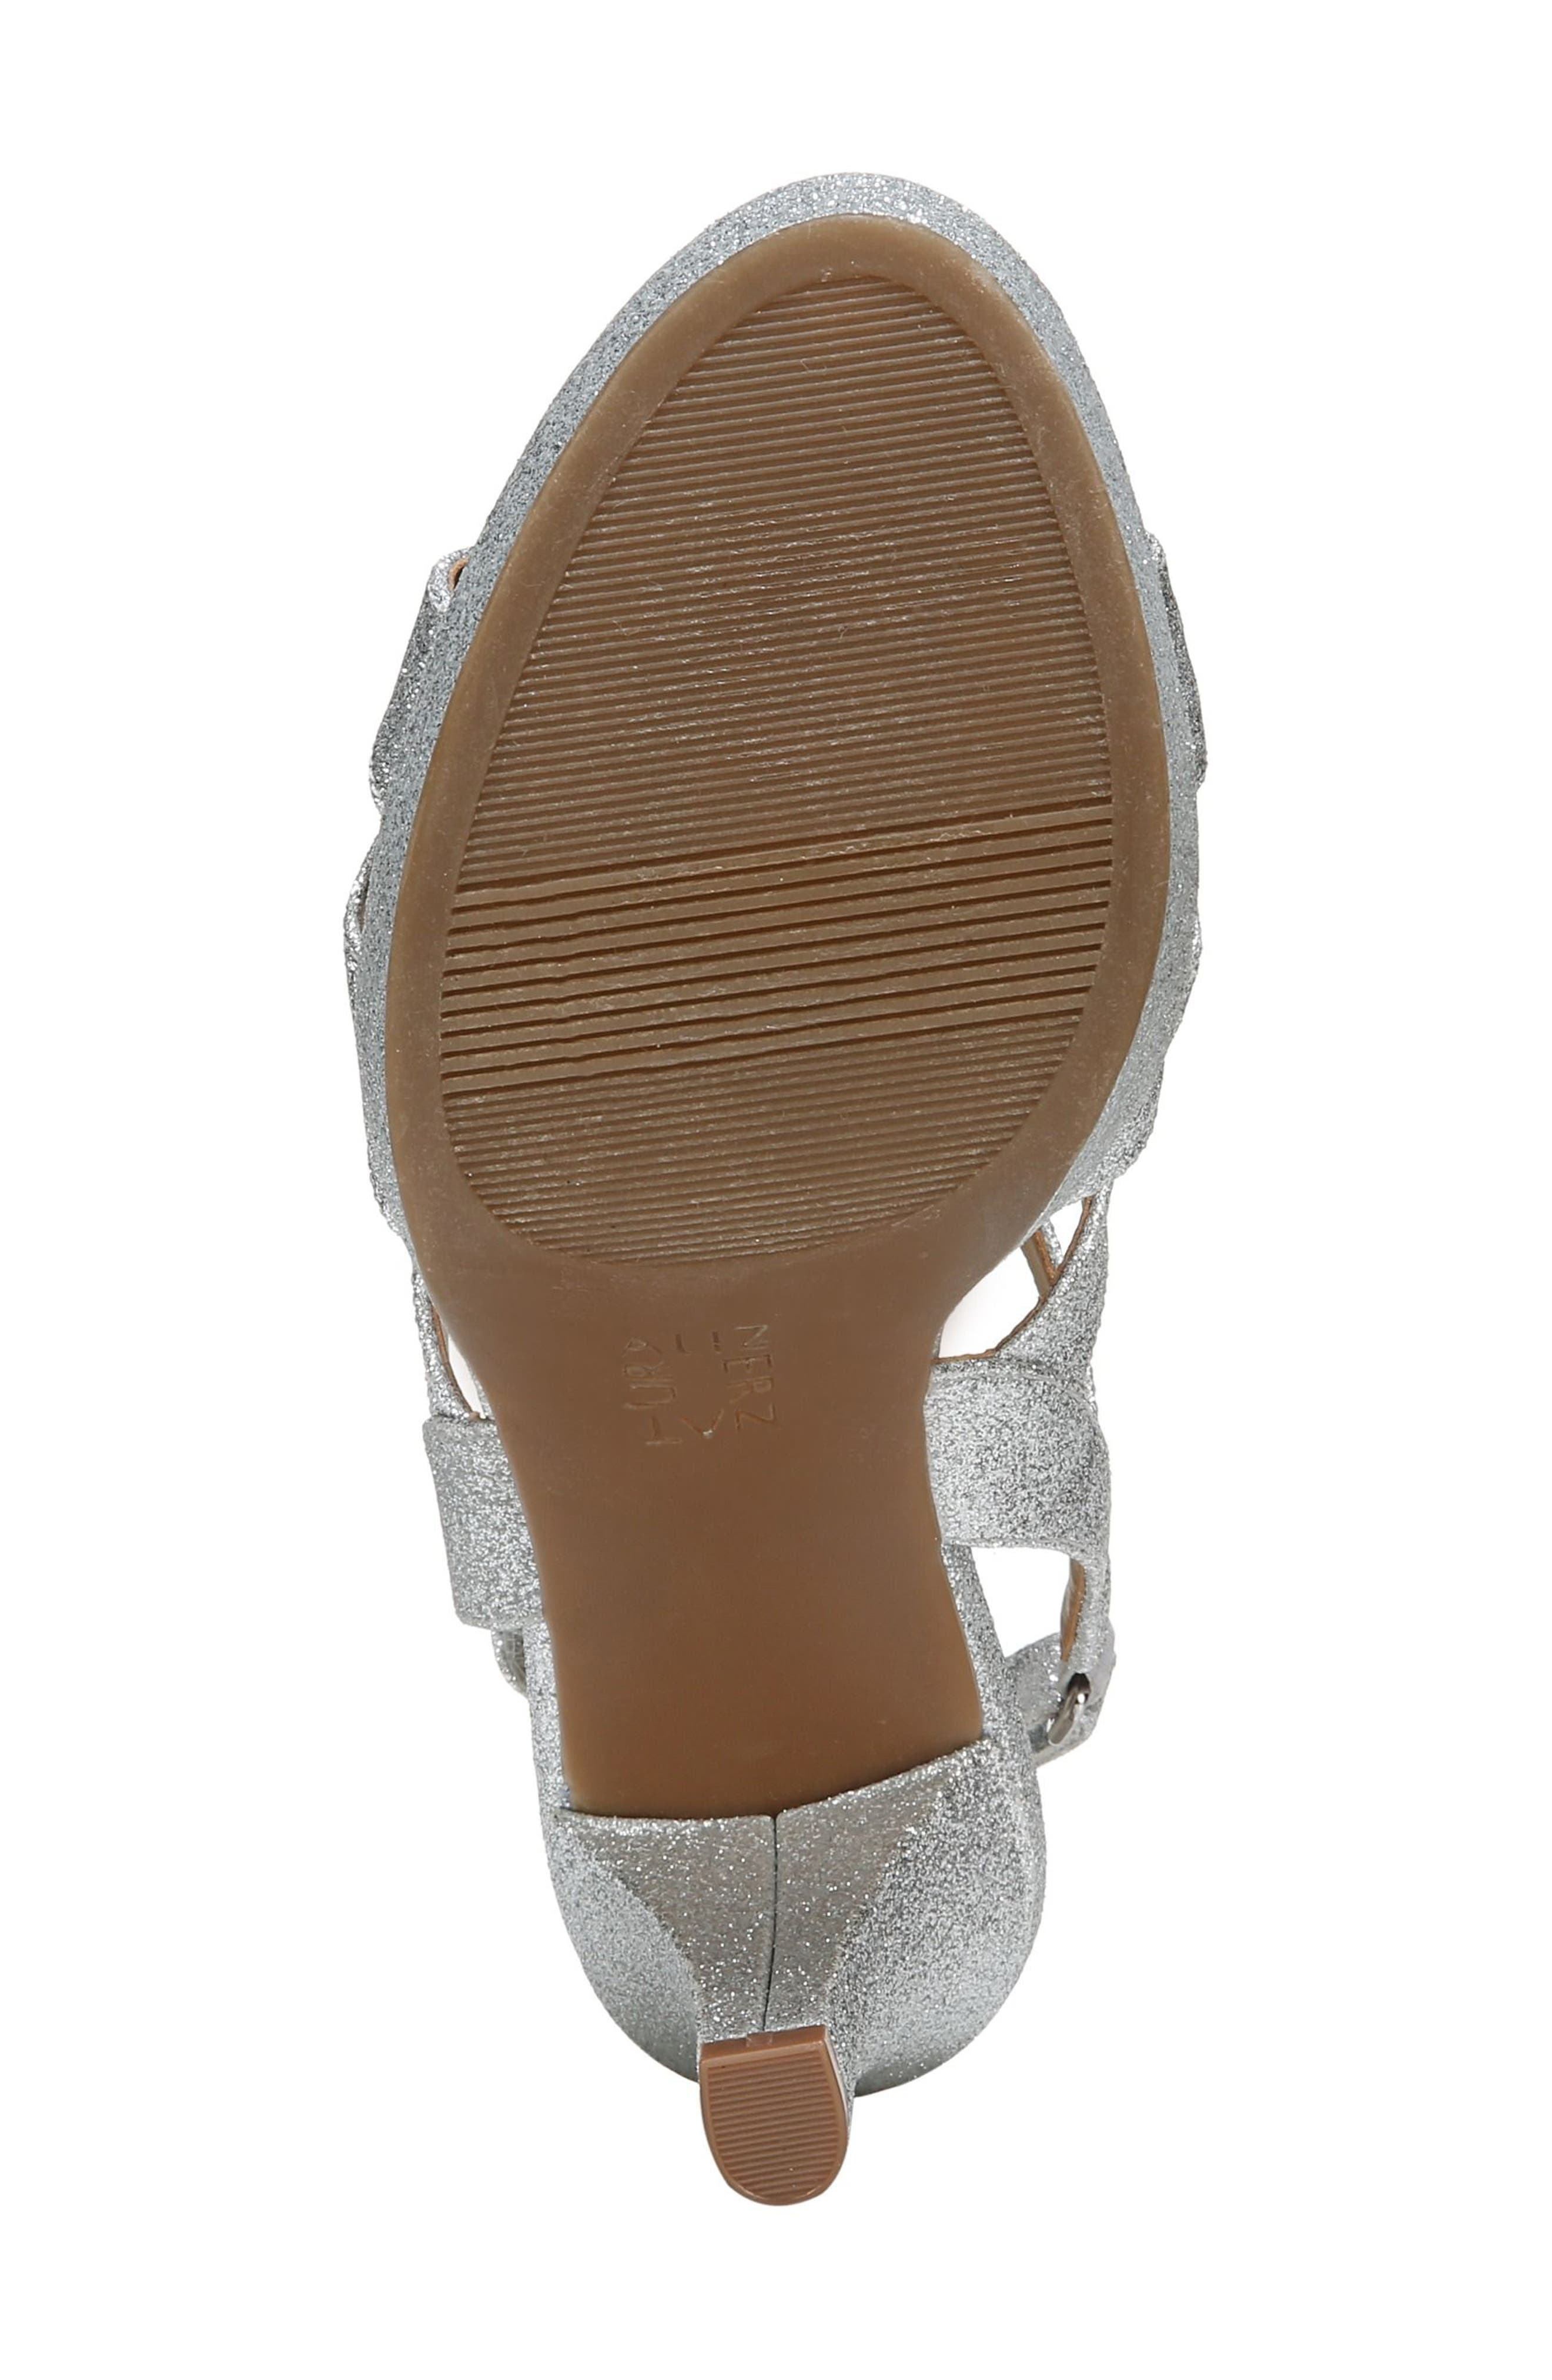 NATURALIZER, 'Pressley' Slingback Platform Sandal, Alternate thumbnail 6, color, SILVER GLITTER FAUX LEATHER